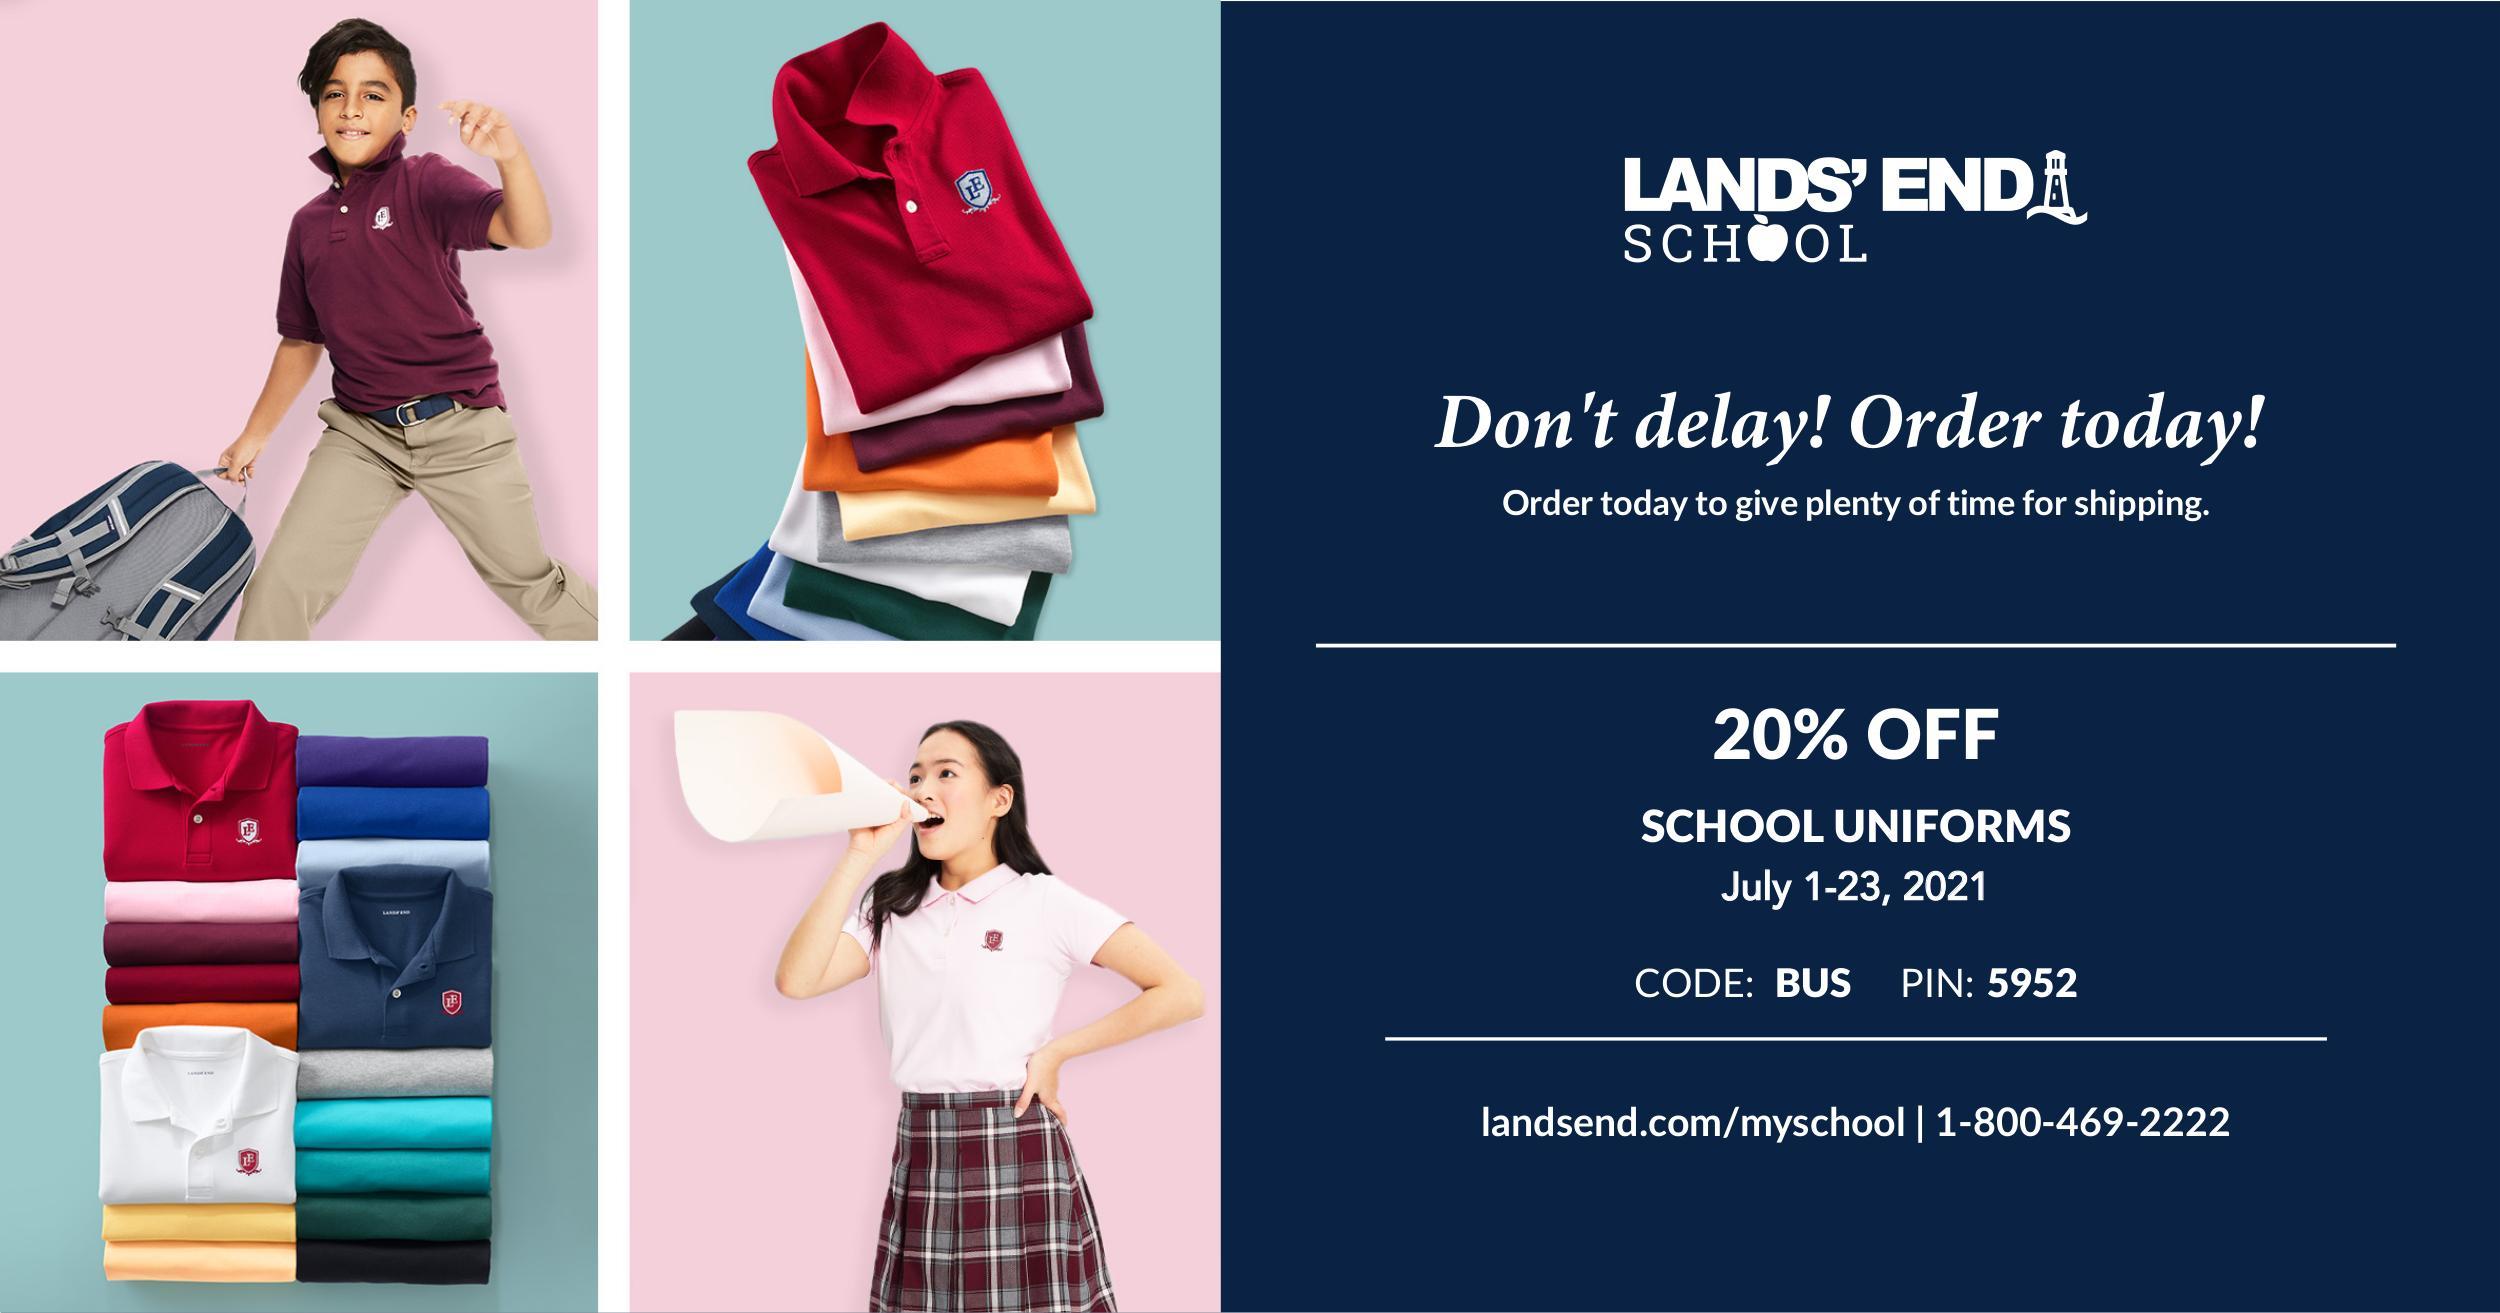 Christian Academy School System   Lands' End Sale   July 1-23, 2021